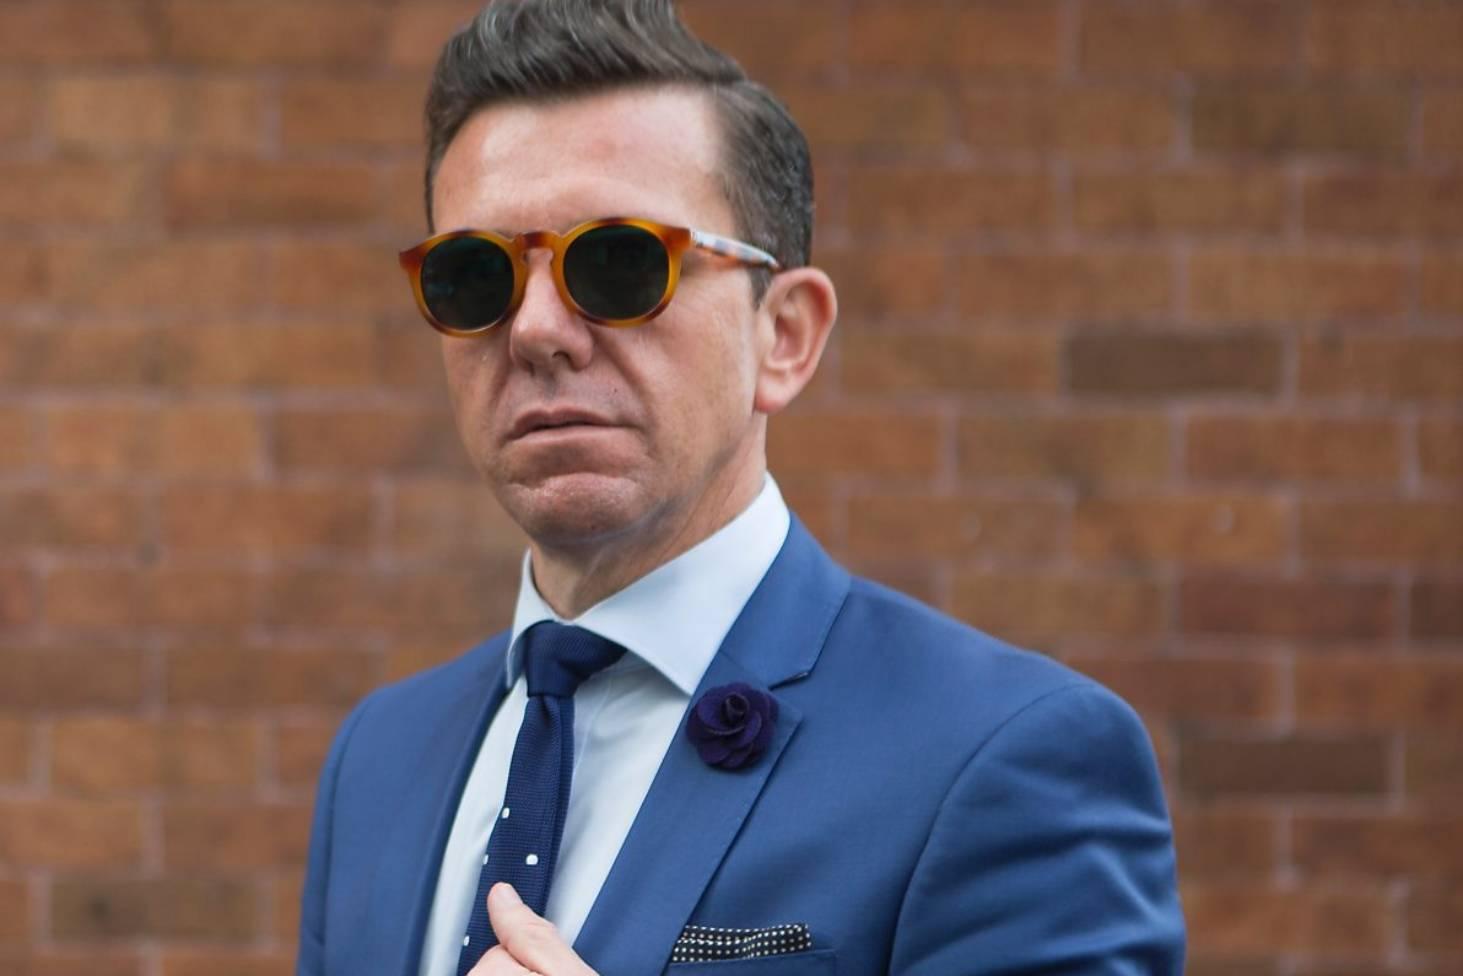 96ecdfc07 Do New Zealand men have bad style? These fashionable Kiwis share ...